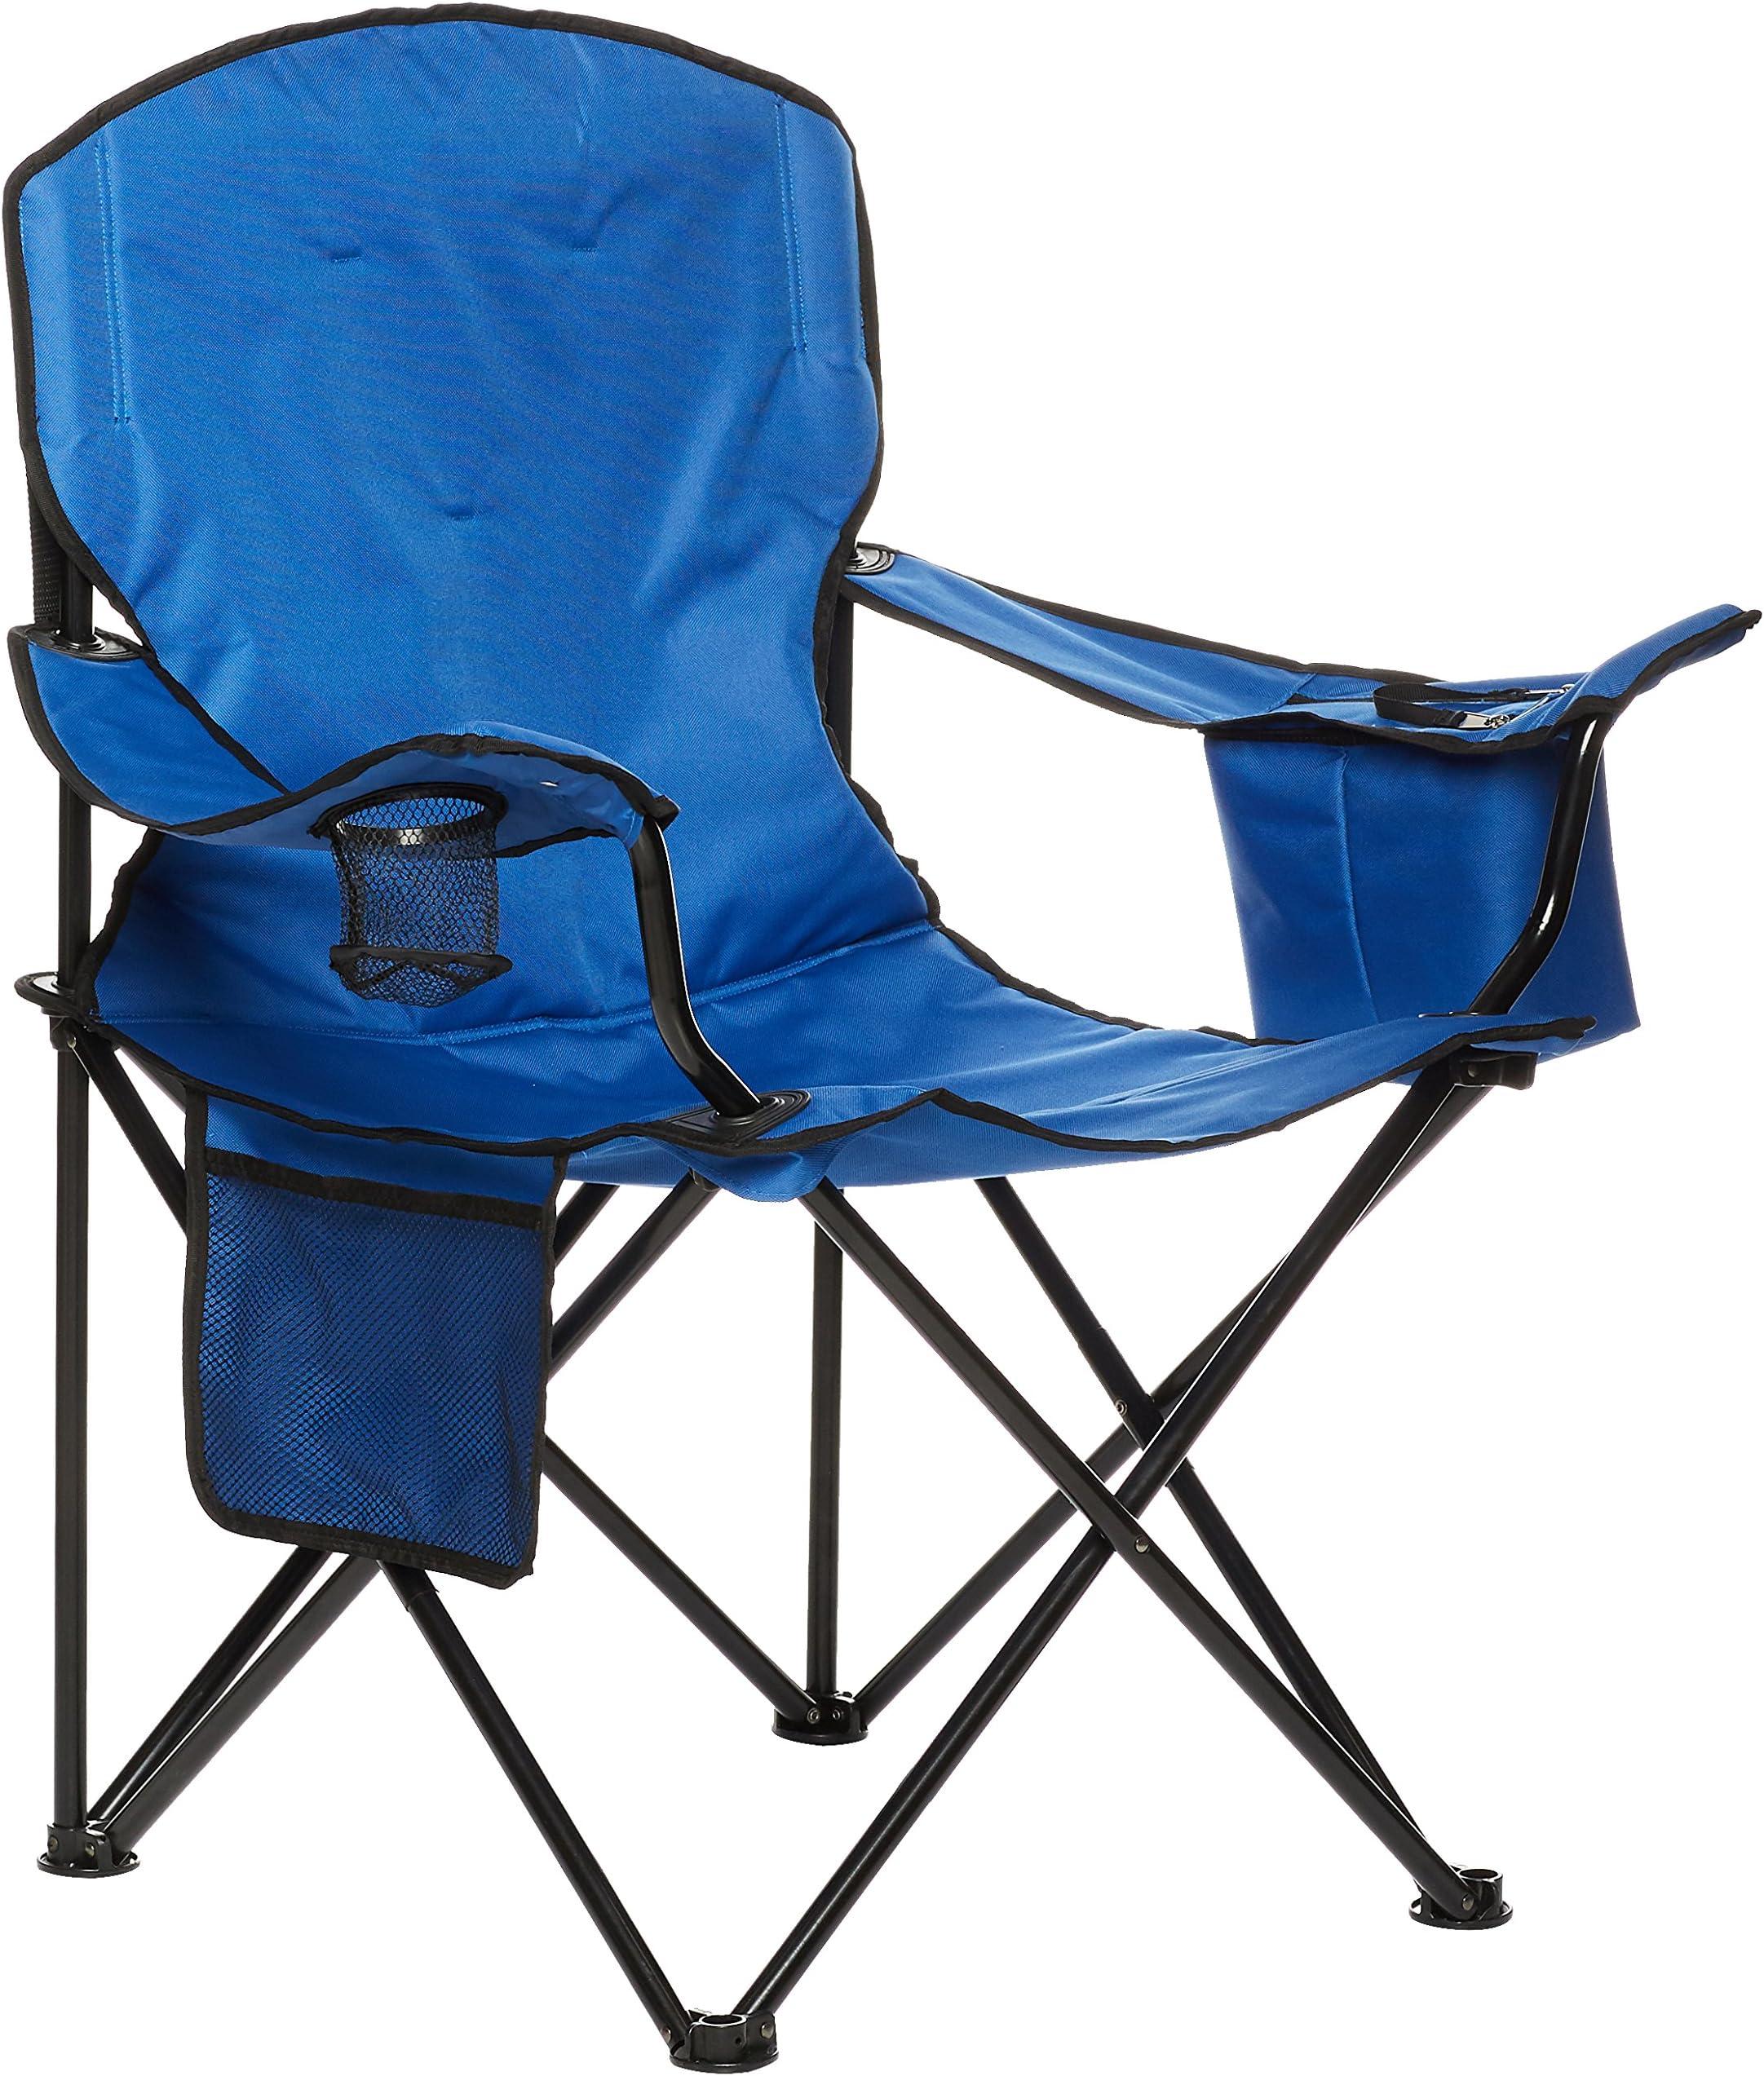 New Coleman Vertex PLUS Hard Arm Portable Camping Quad Chair BIG /& TALL 300lb